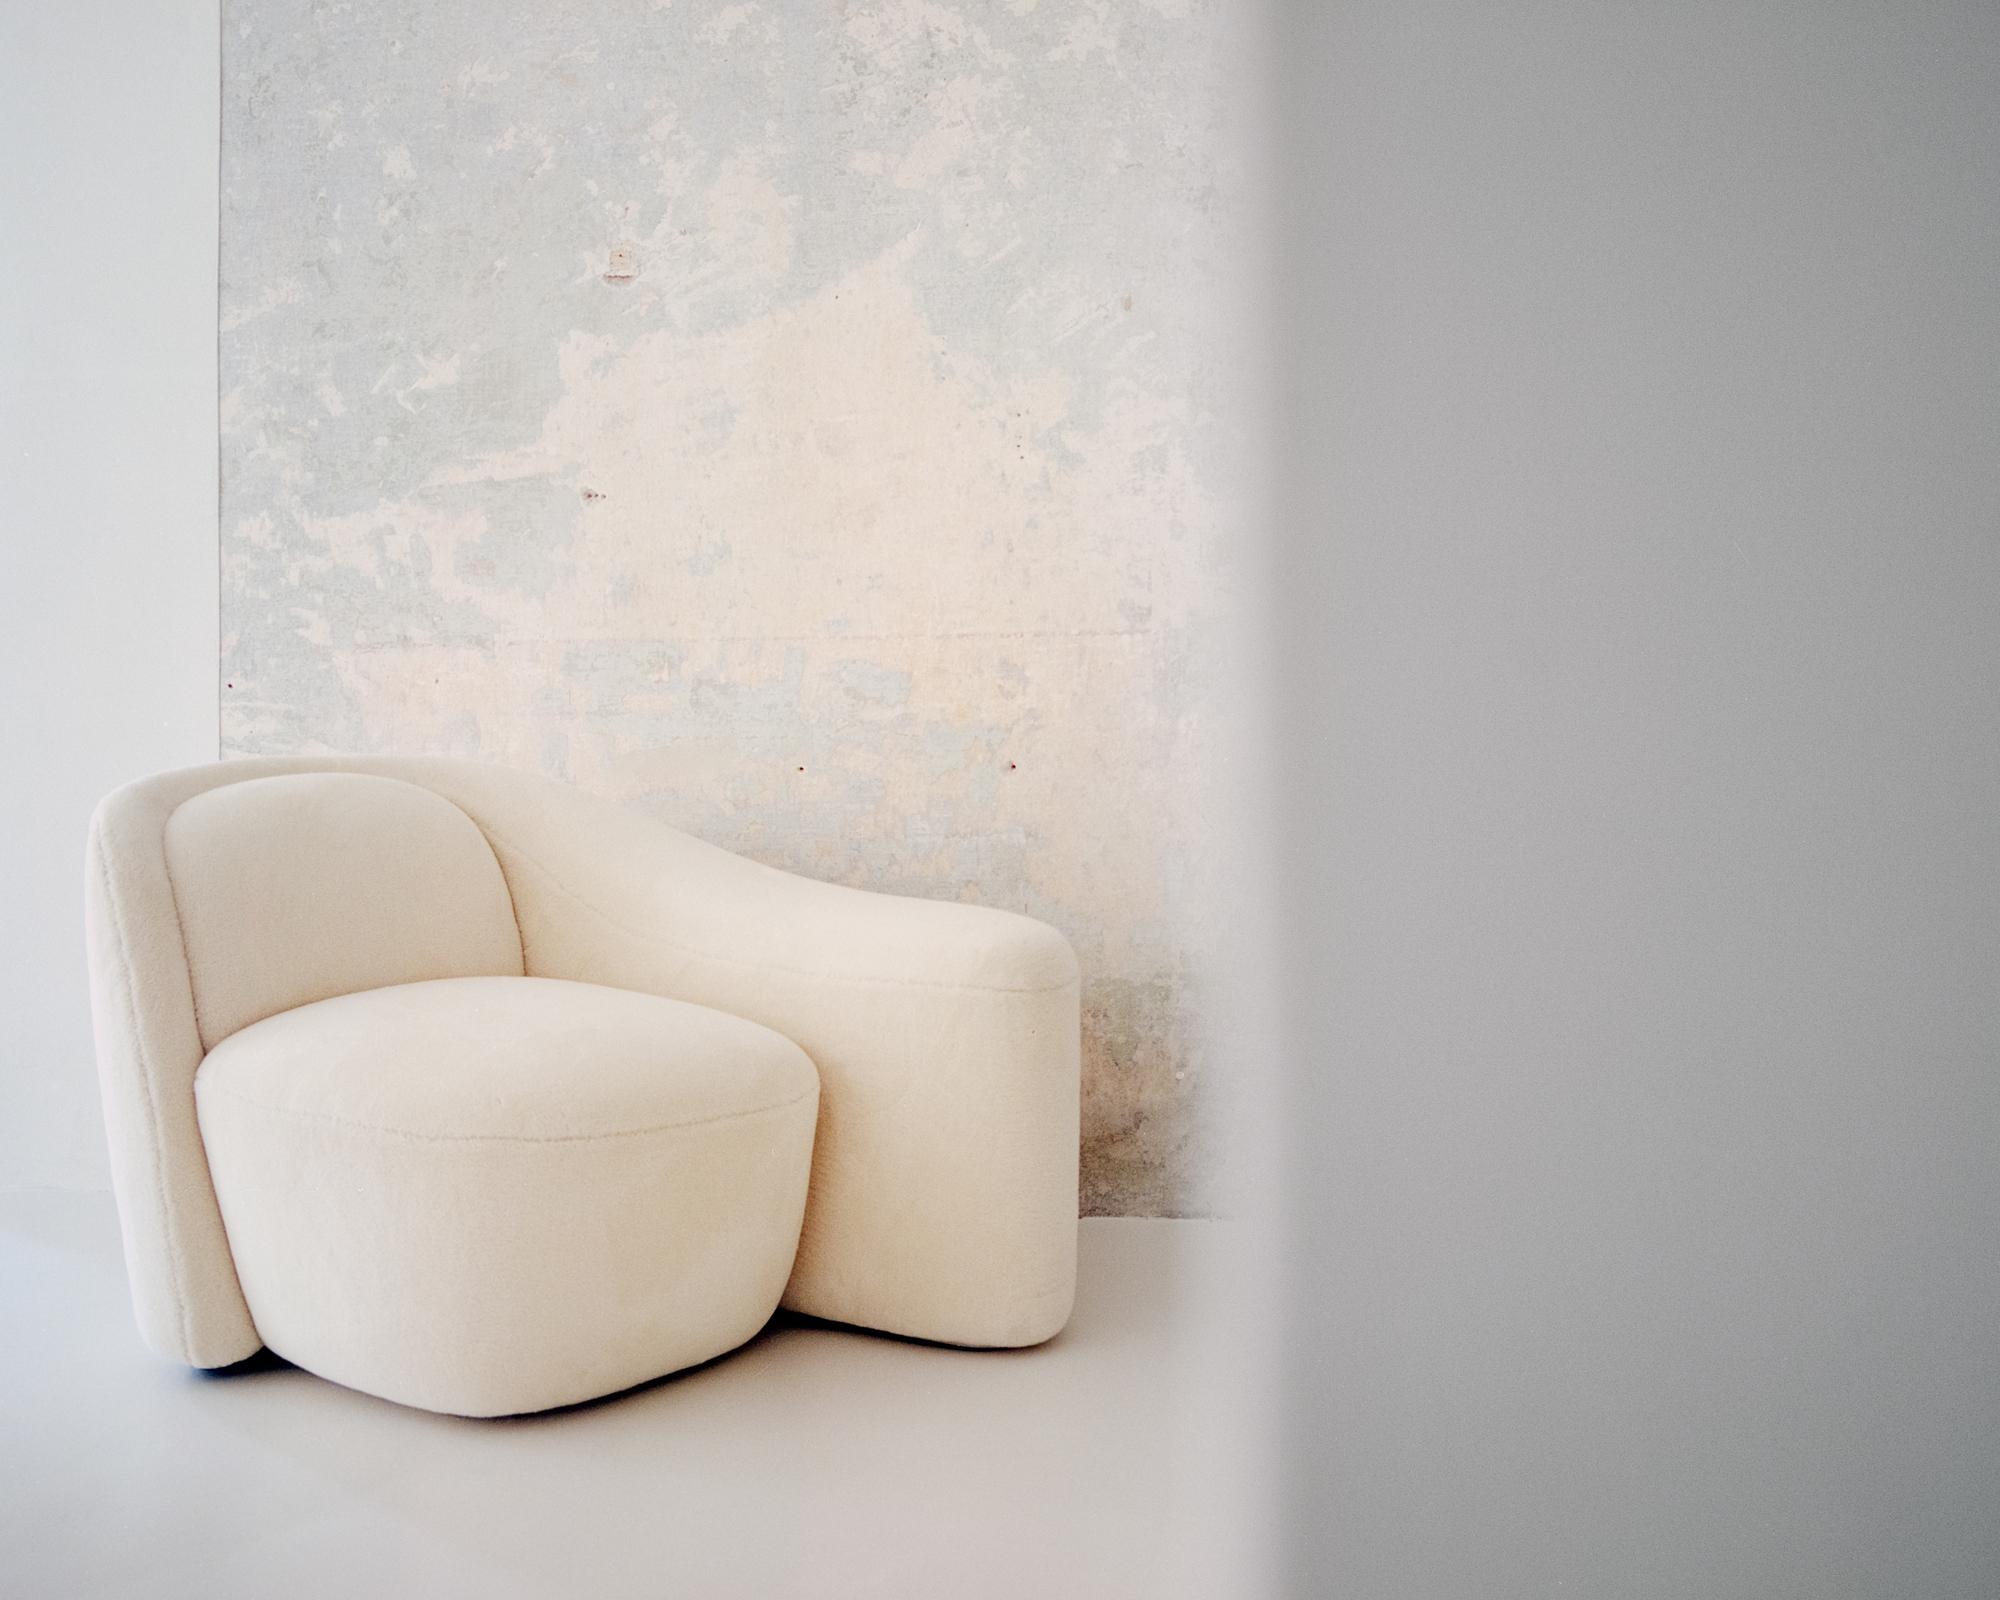 Loro Piana Interiors / ChaiselongueThe Palm Duet von Raphael Navot / Foto: Loro Piana